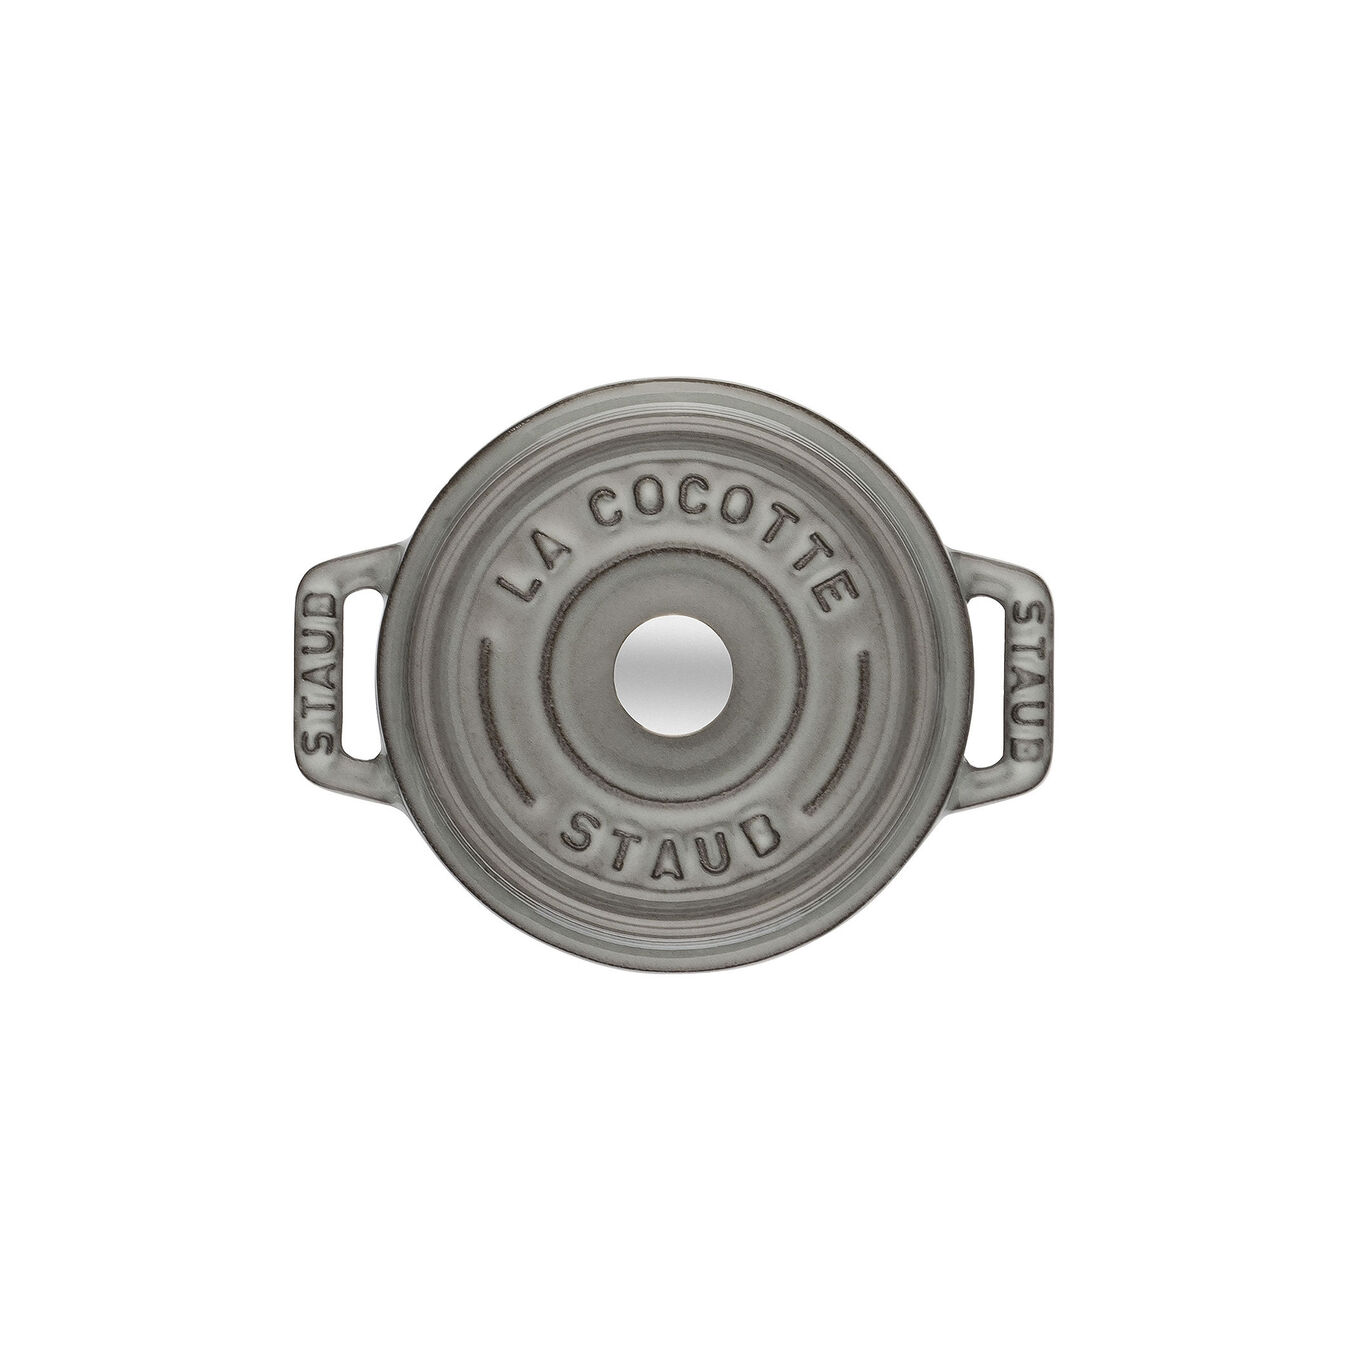 Mini Cocotte 10 cm, rund, Graphit-Grau, Gusseisen,,large 2